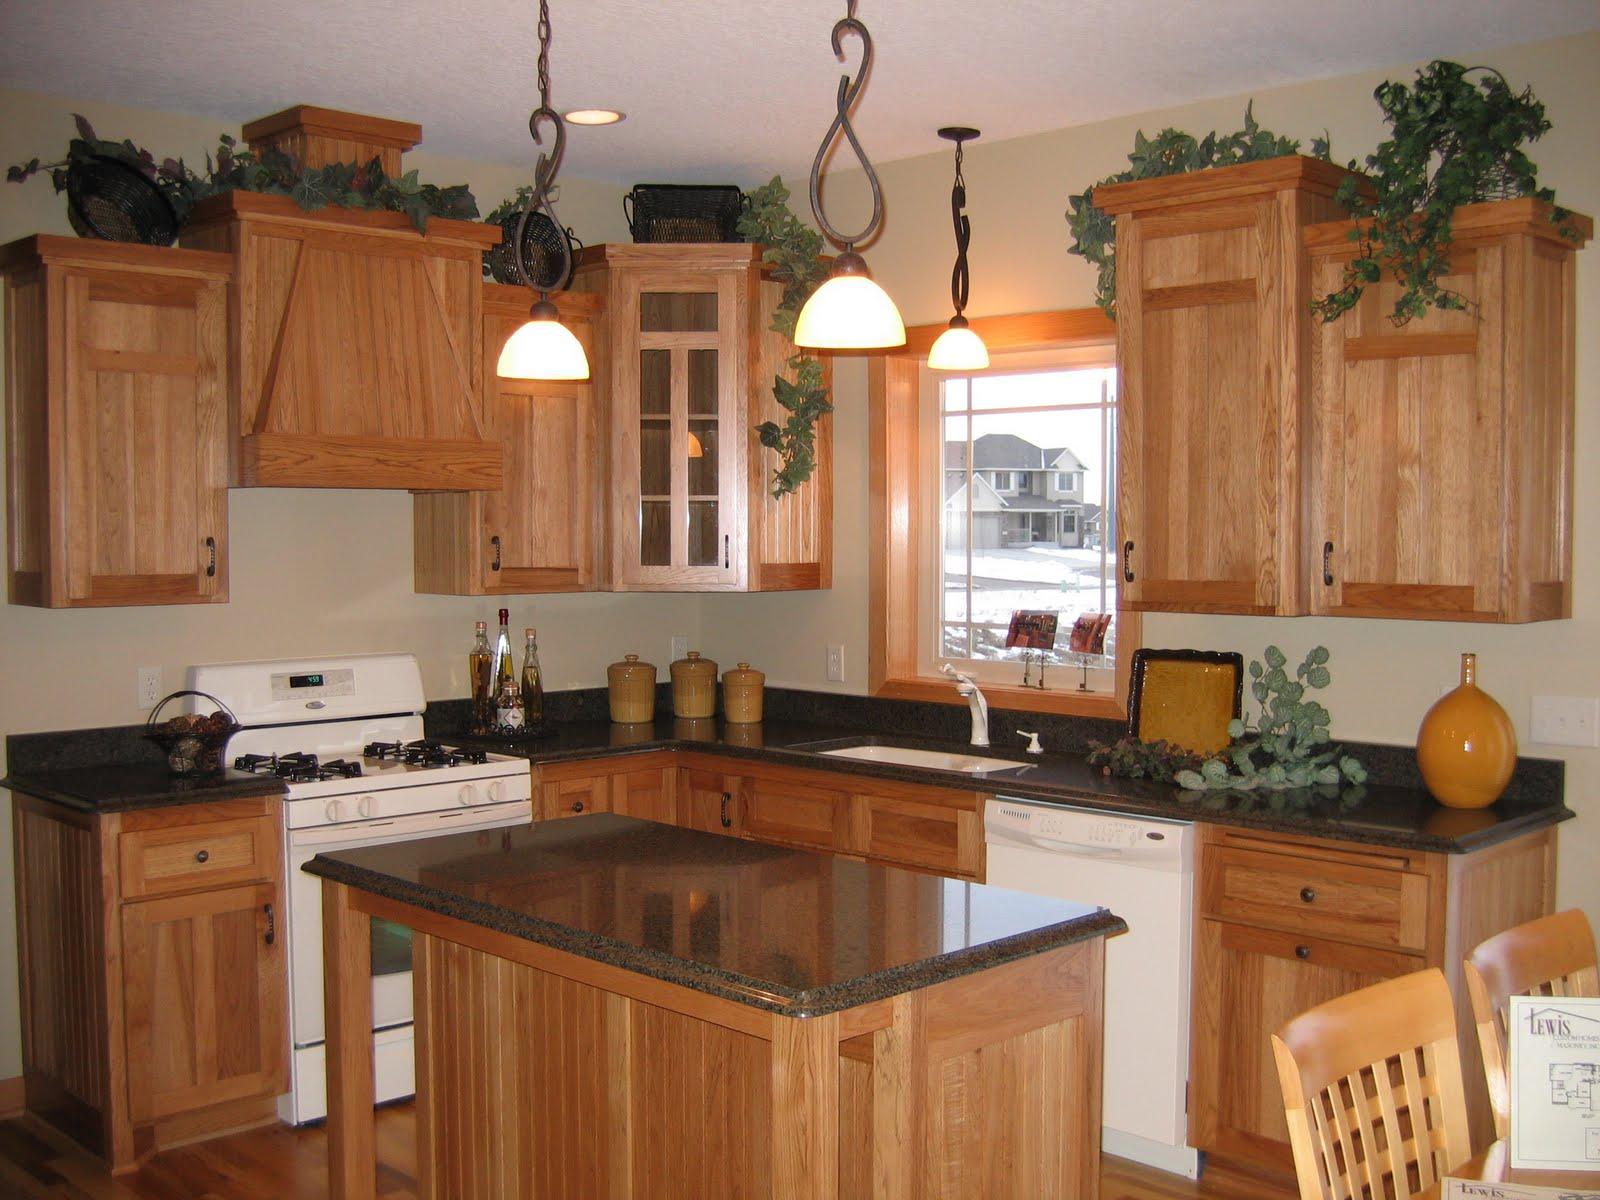 Kitchen Cabinets Sarasota Soapstone Sink Florida